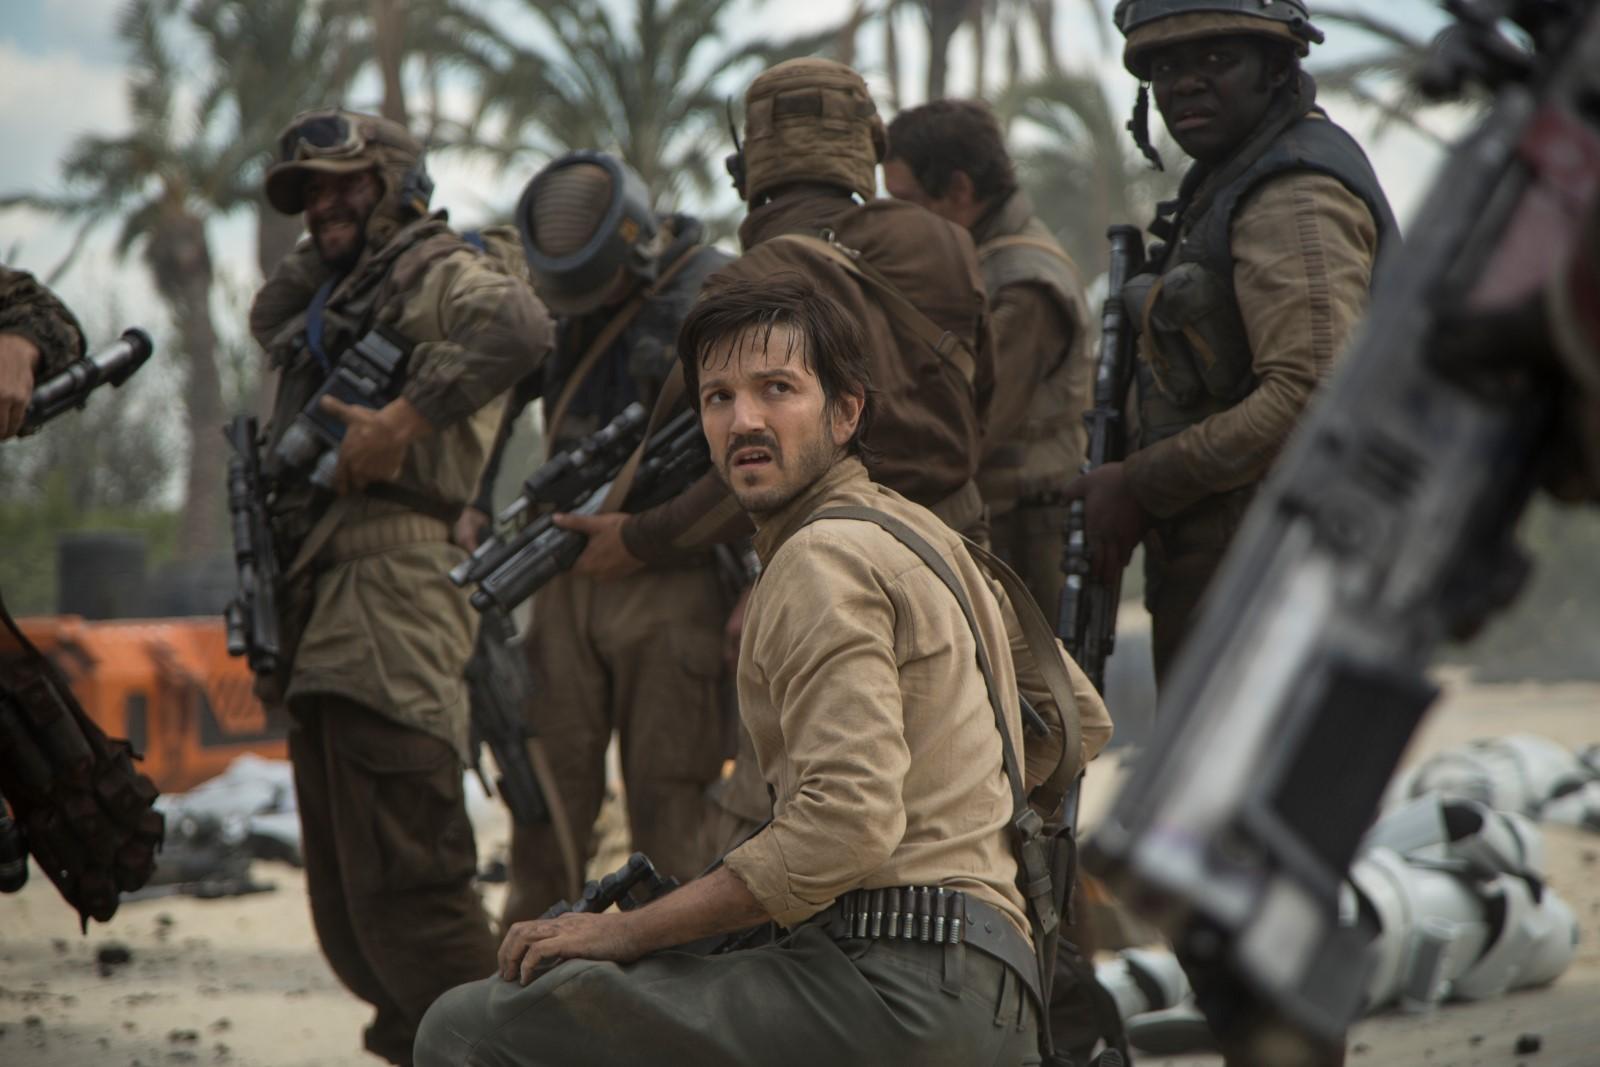 Diego Luna to Star in 'Star Wars: Rogue One' Prequel Series